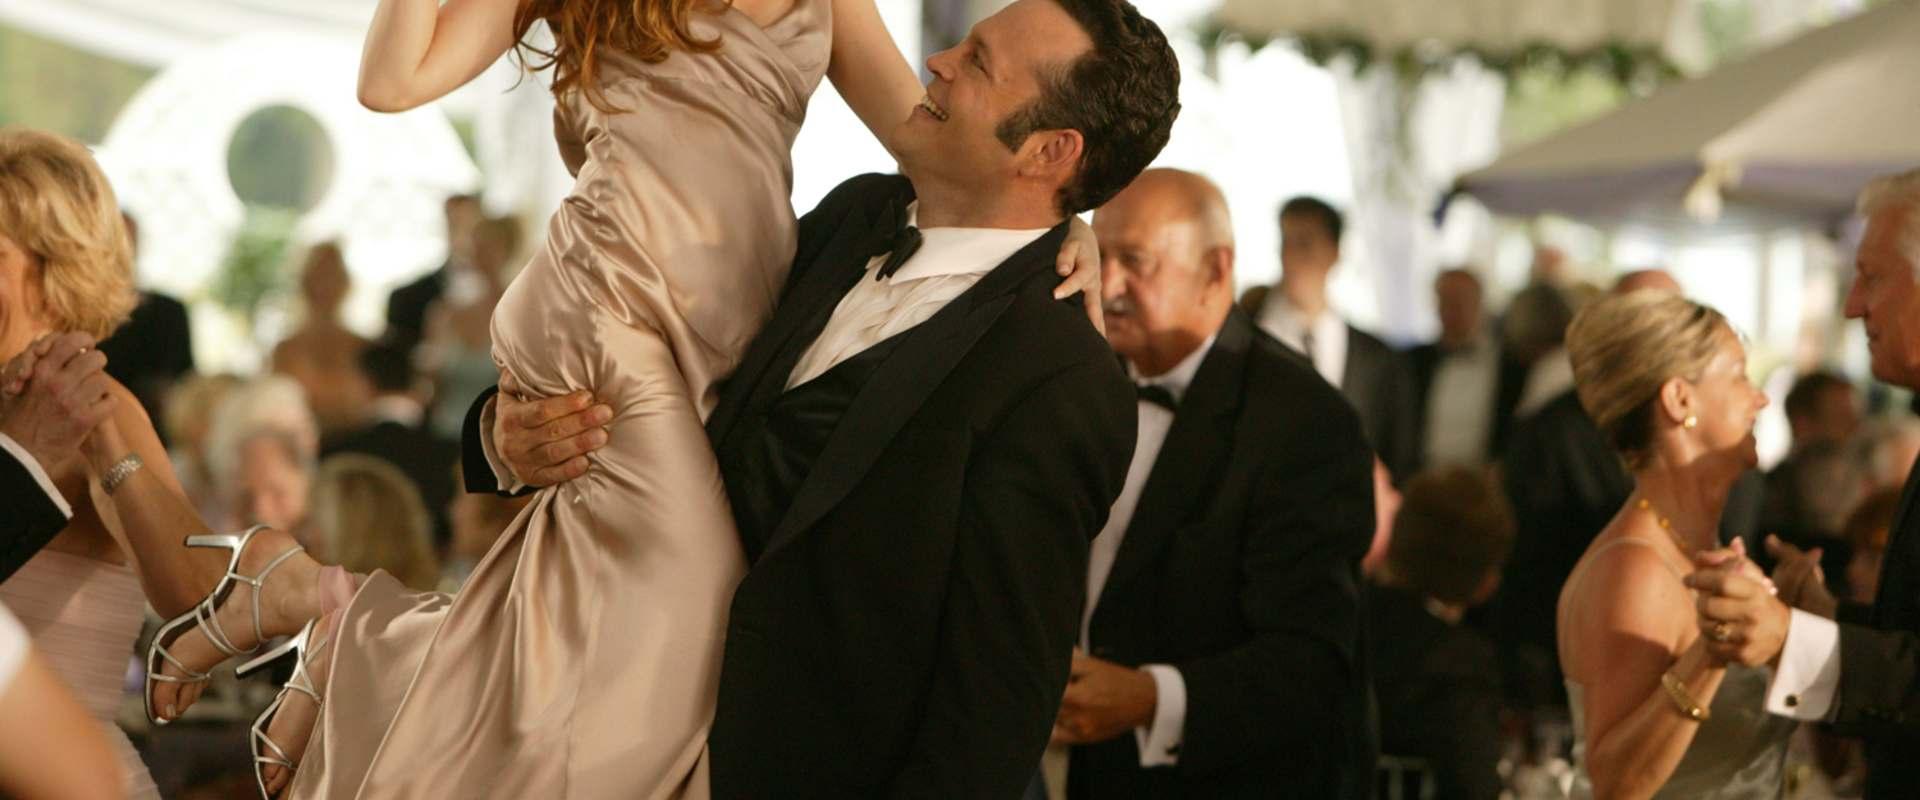 Watch on NetflixMovies.com Crashers Today! Netflix   Wedding